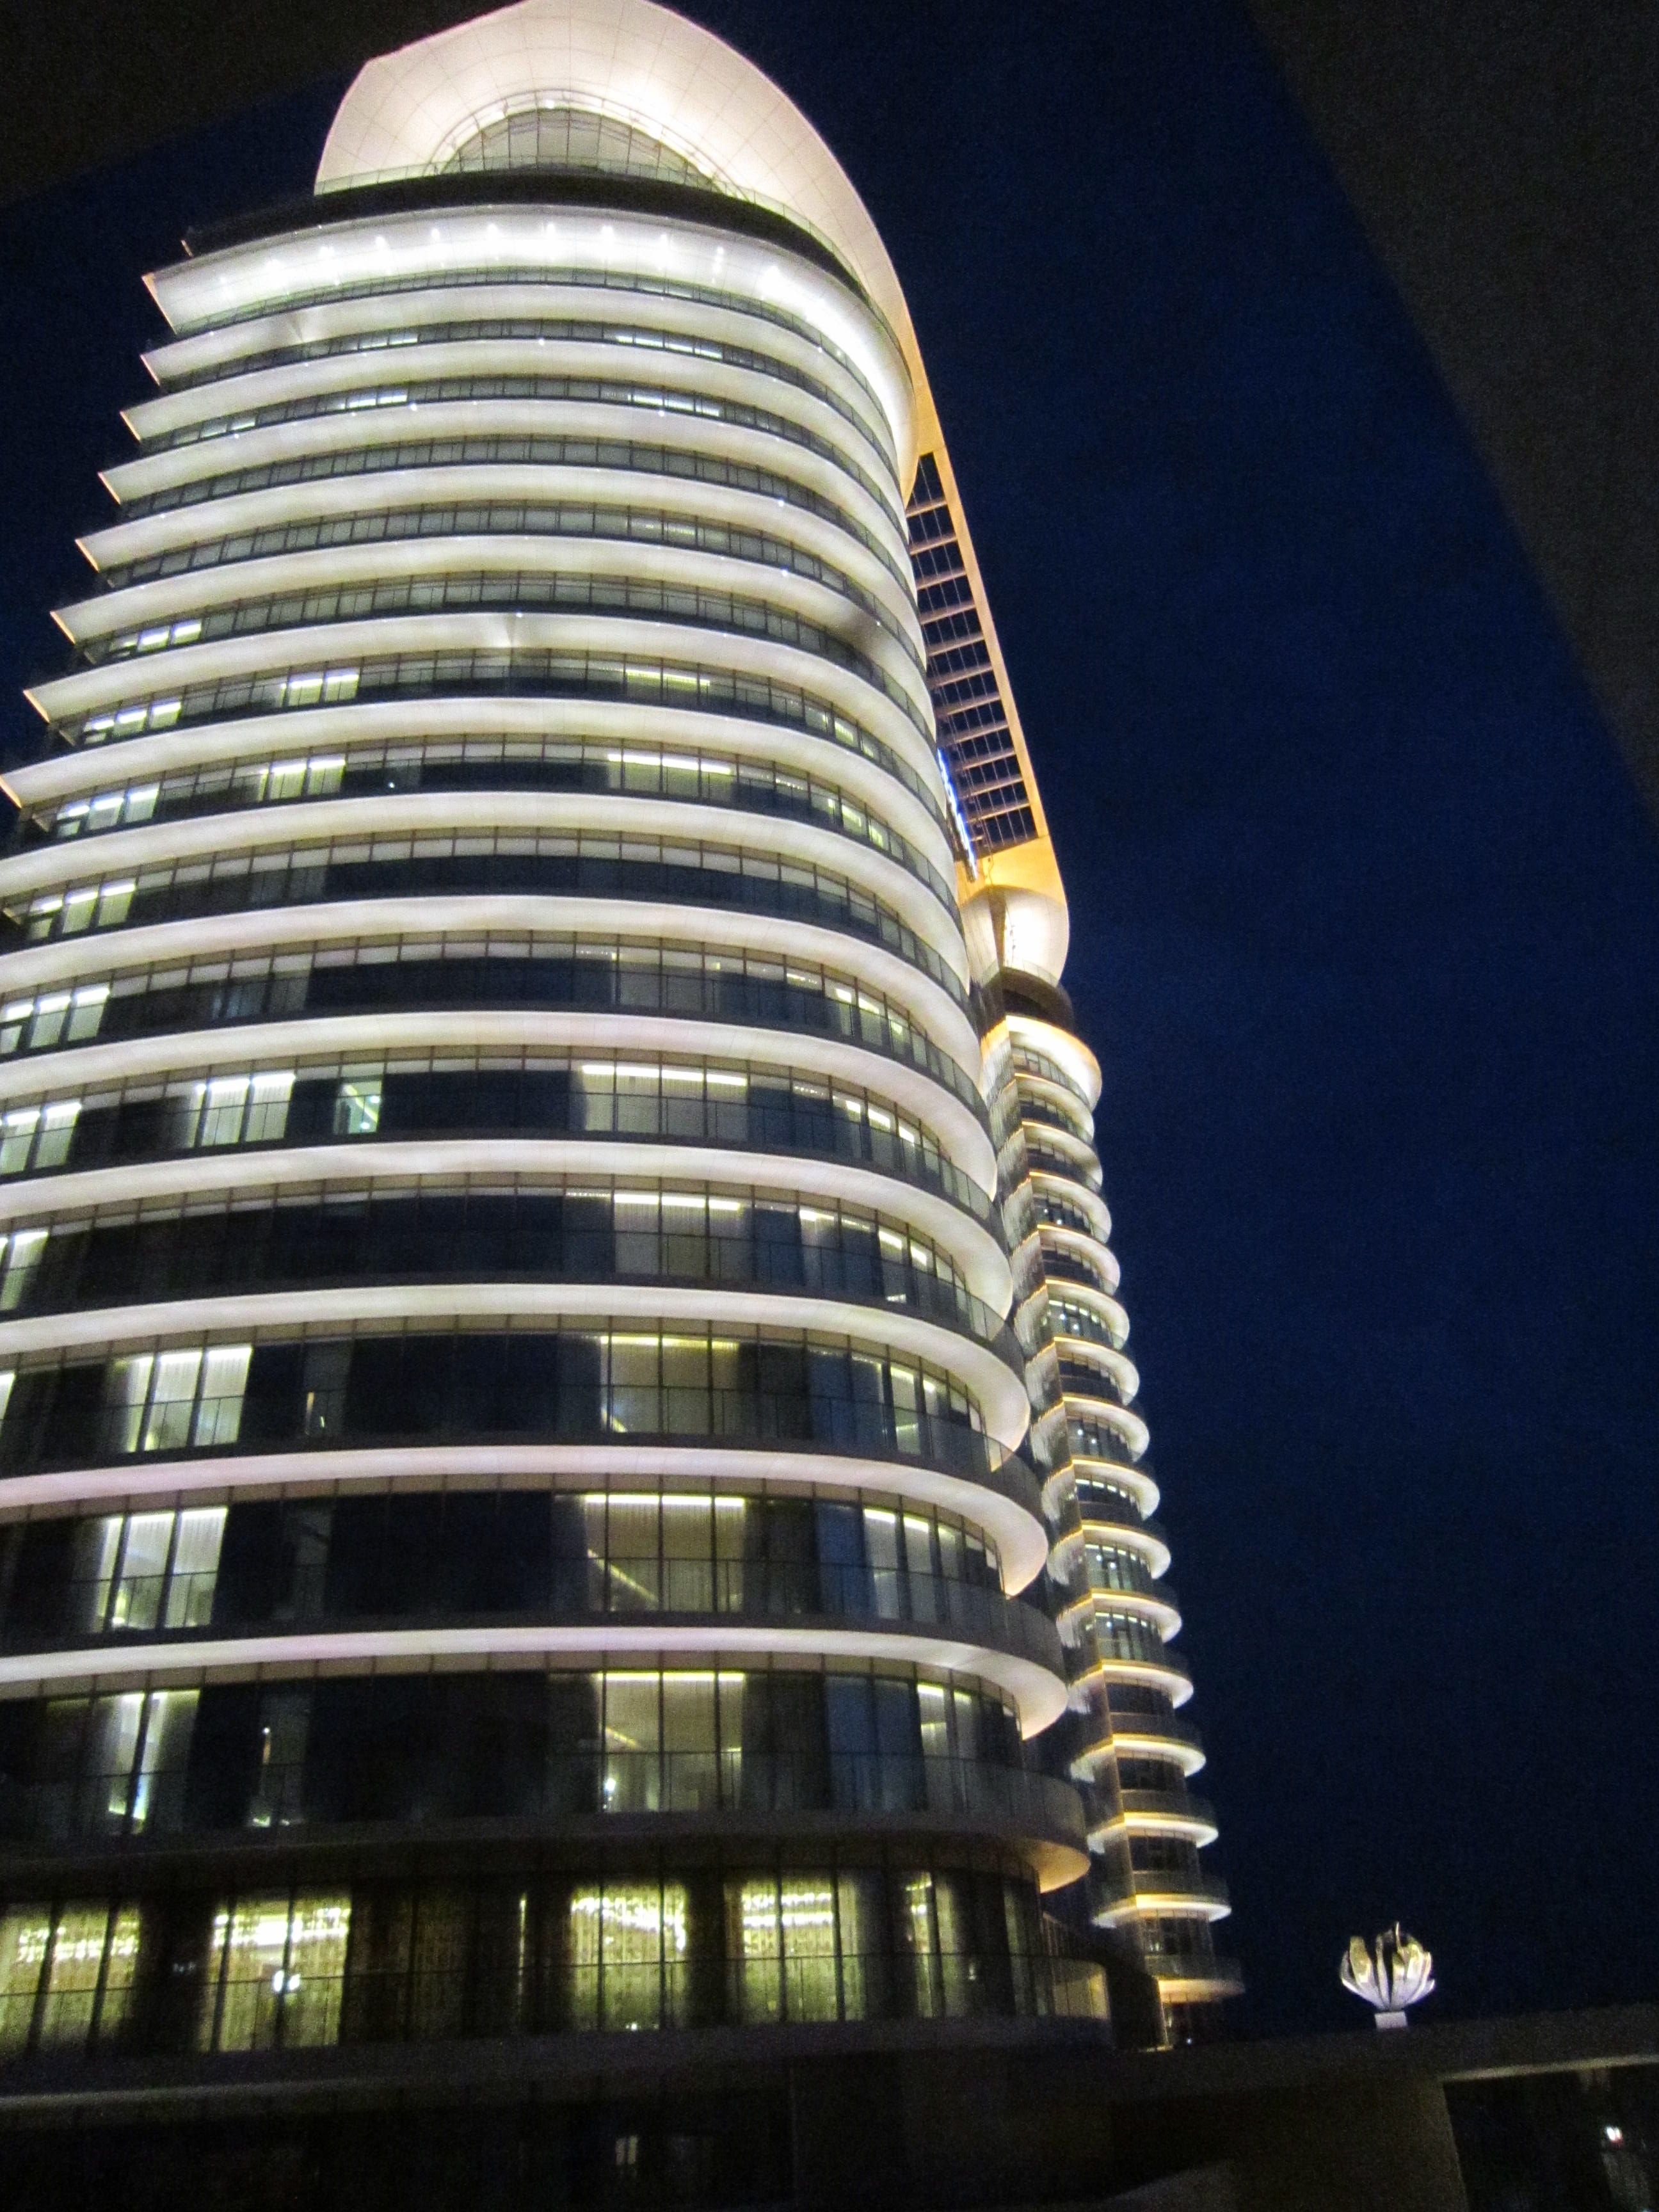 Baku Azerbaijan Absheron Hotel Hotel Getaways Hotels And Resorts Resort